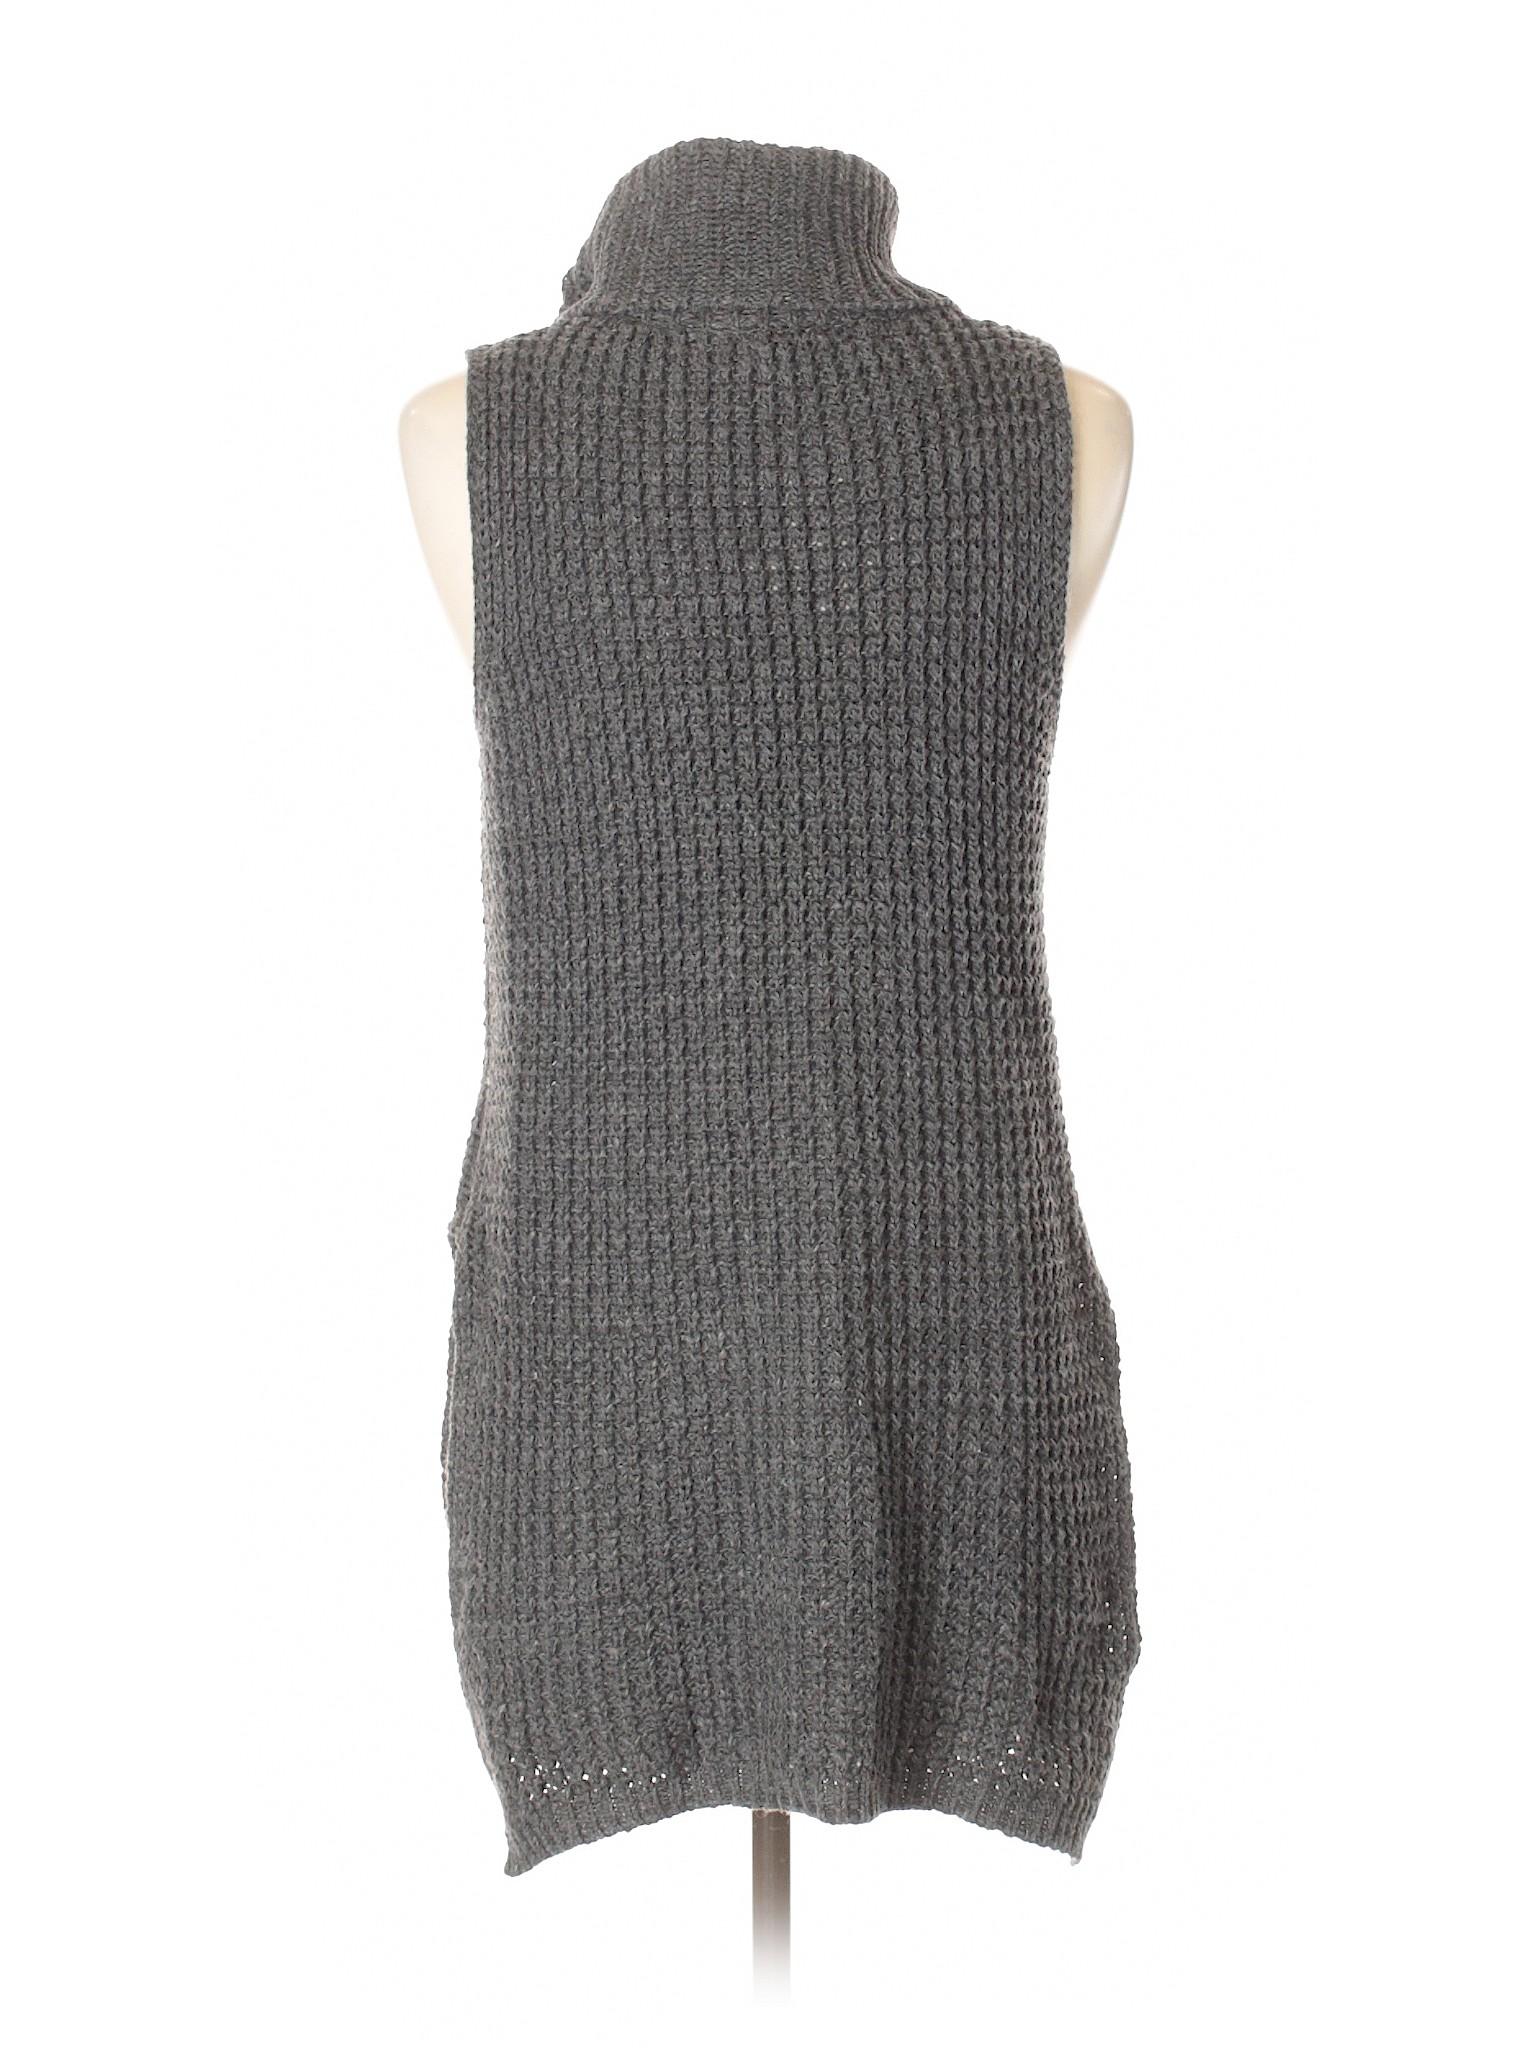 Girl Sweater Pullover Pullover Sweater Sunny Sunny Boutique Pullover Boutique Sunny Boutique Sweater Girl Girl POwA7